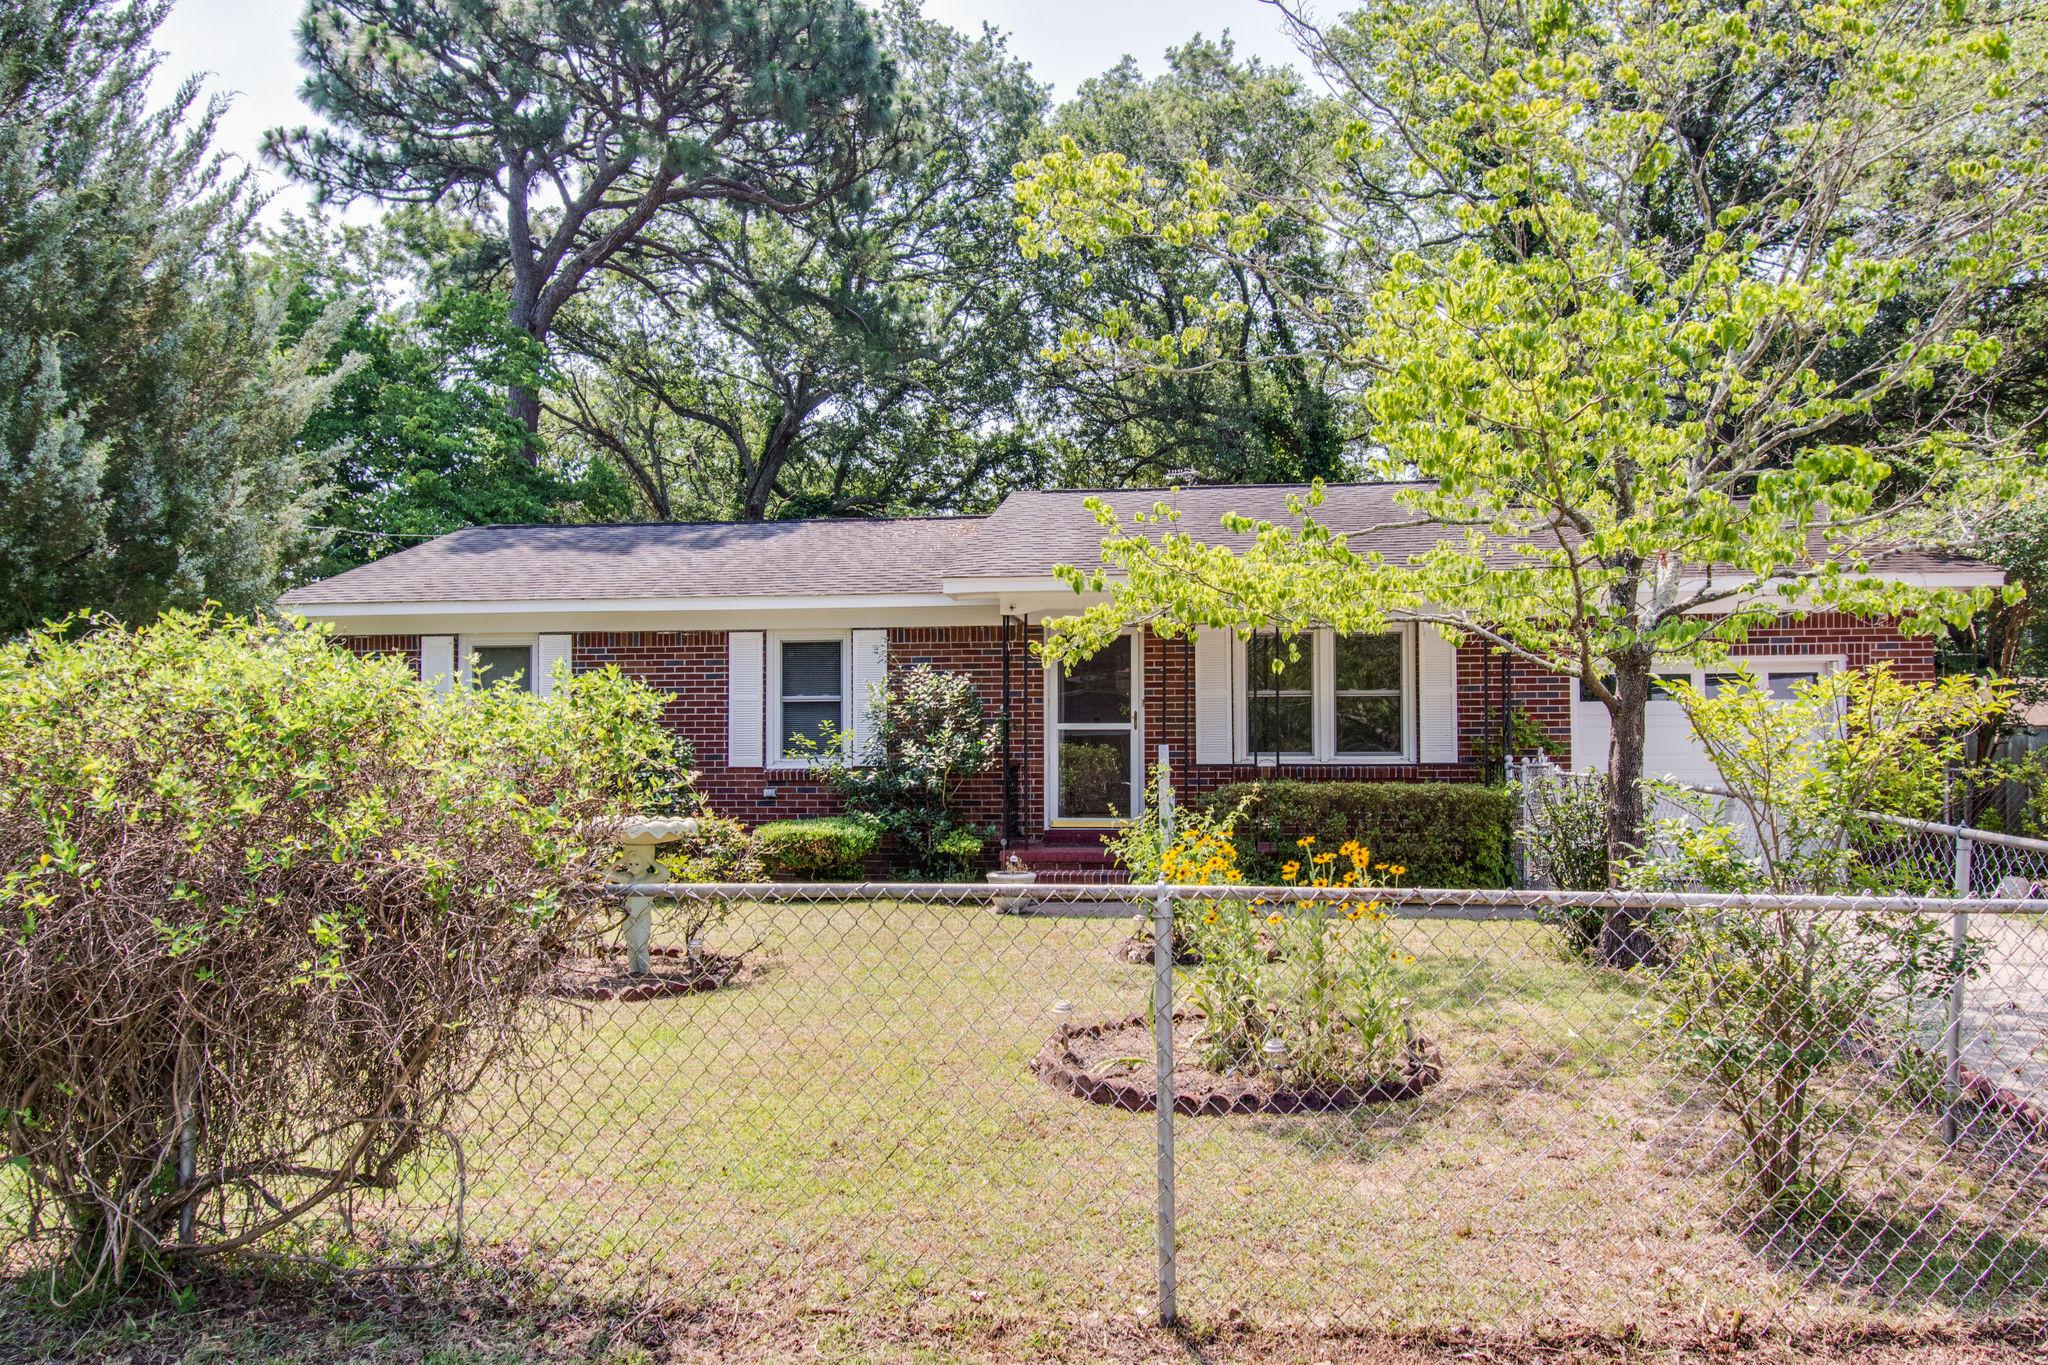 Old Mt Pleasant Homes For Sale - 1327 Lonnie, Mount Pleasant, SC - 3